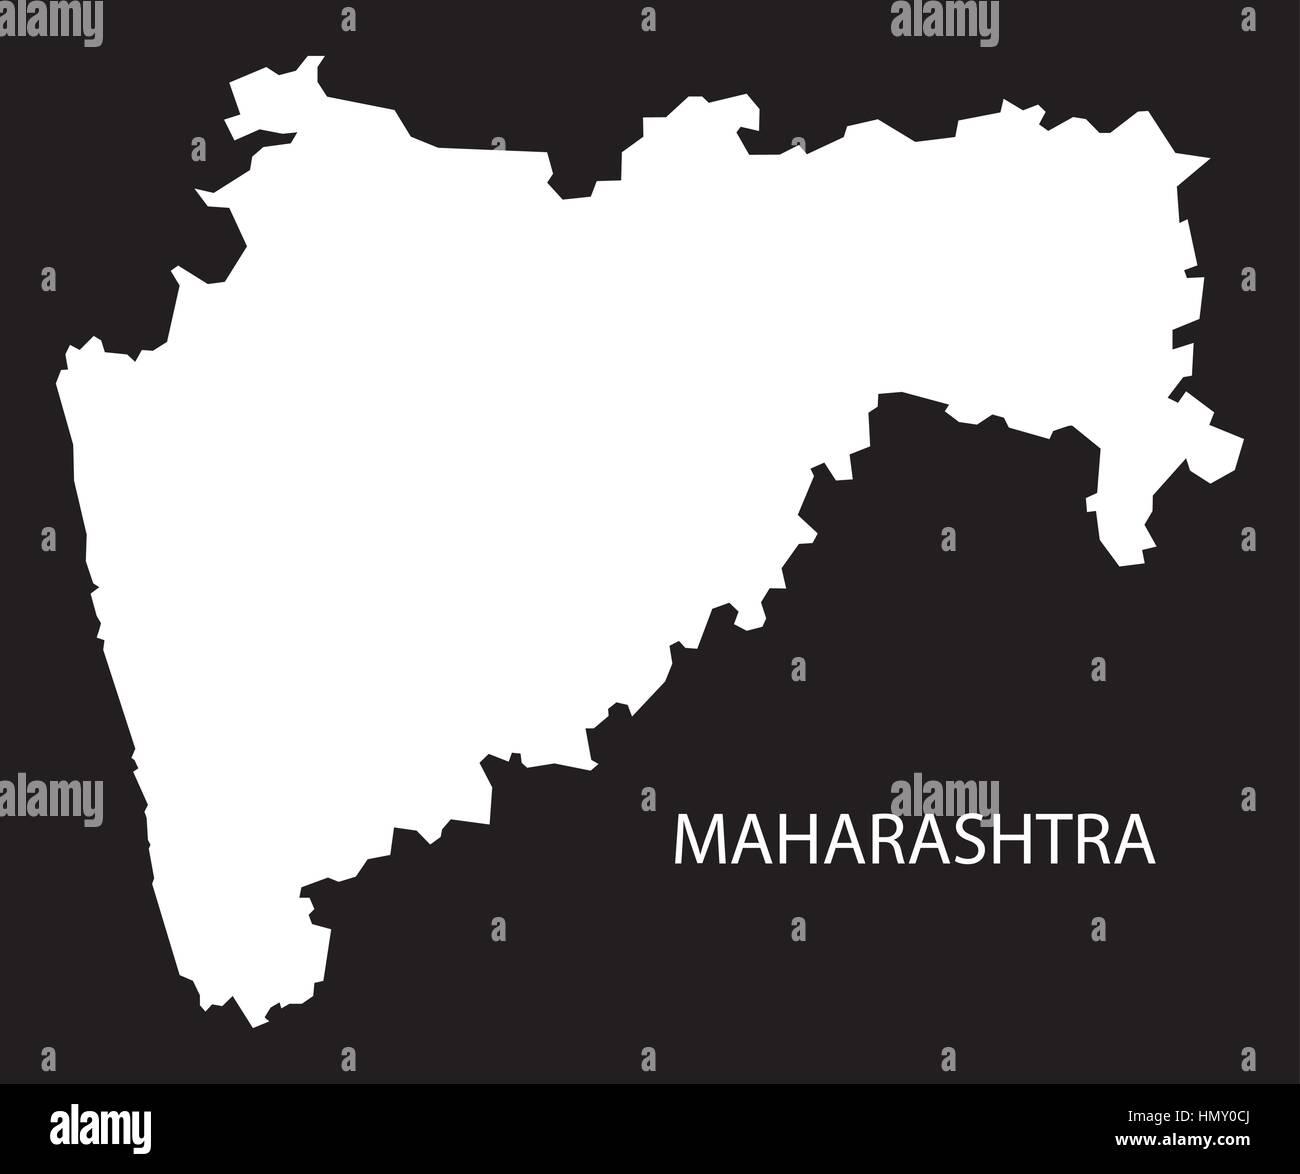 Maharashtra Map Stock Photos & Maharashtra Map Stock Images ... on ajanta on map, goa map, bihar map, india map, nagaland map, arunachal pradesh map, madhya pradesh map, kashmir map, andhra pradesh map, west bengal map, aurangabad map, nagpur map, chhatrapati shivaji international airport map, meghalaya map, pune region map, punjab map, gujarat map, palghar district map, tripura map, mumbai map,